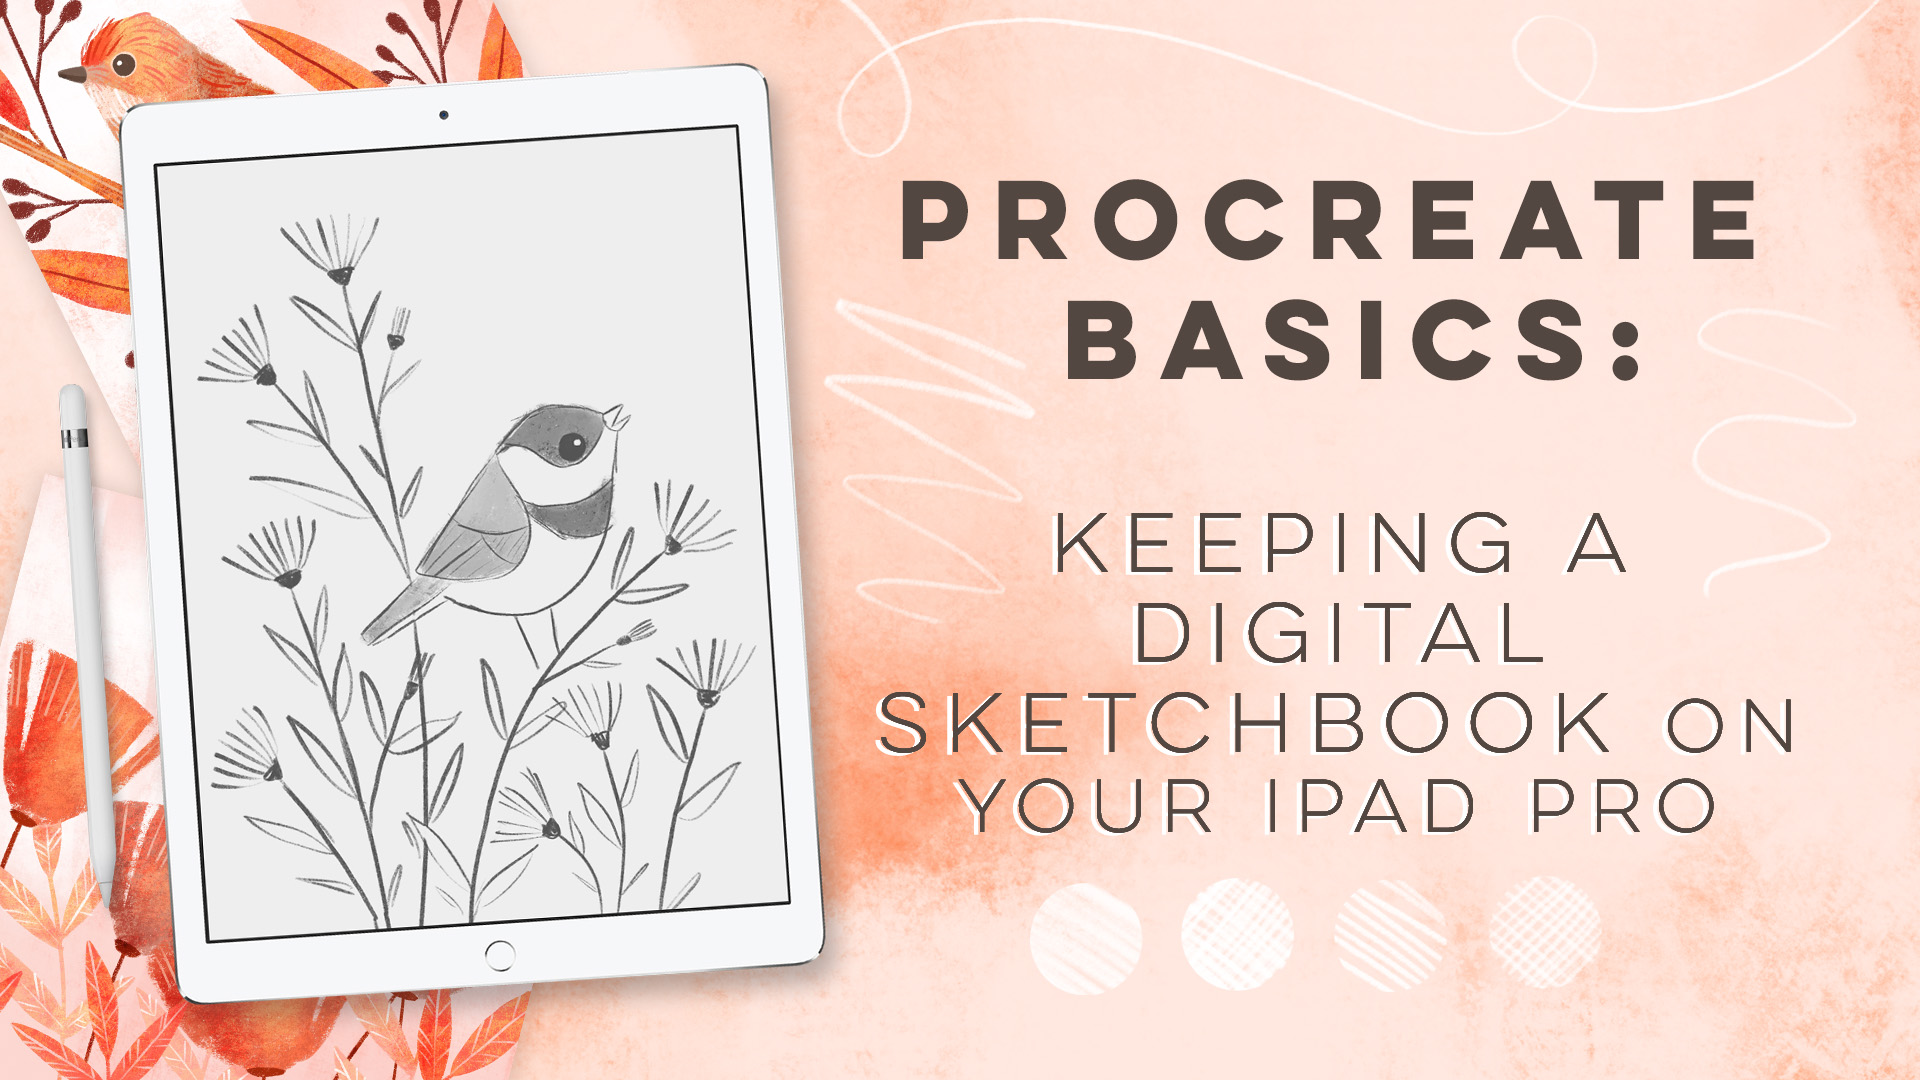 procreate sketchbook cover image.jpg